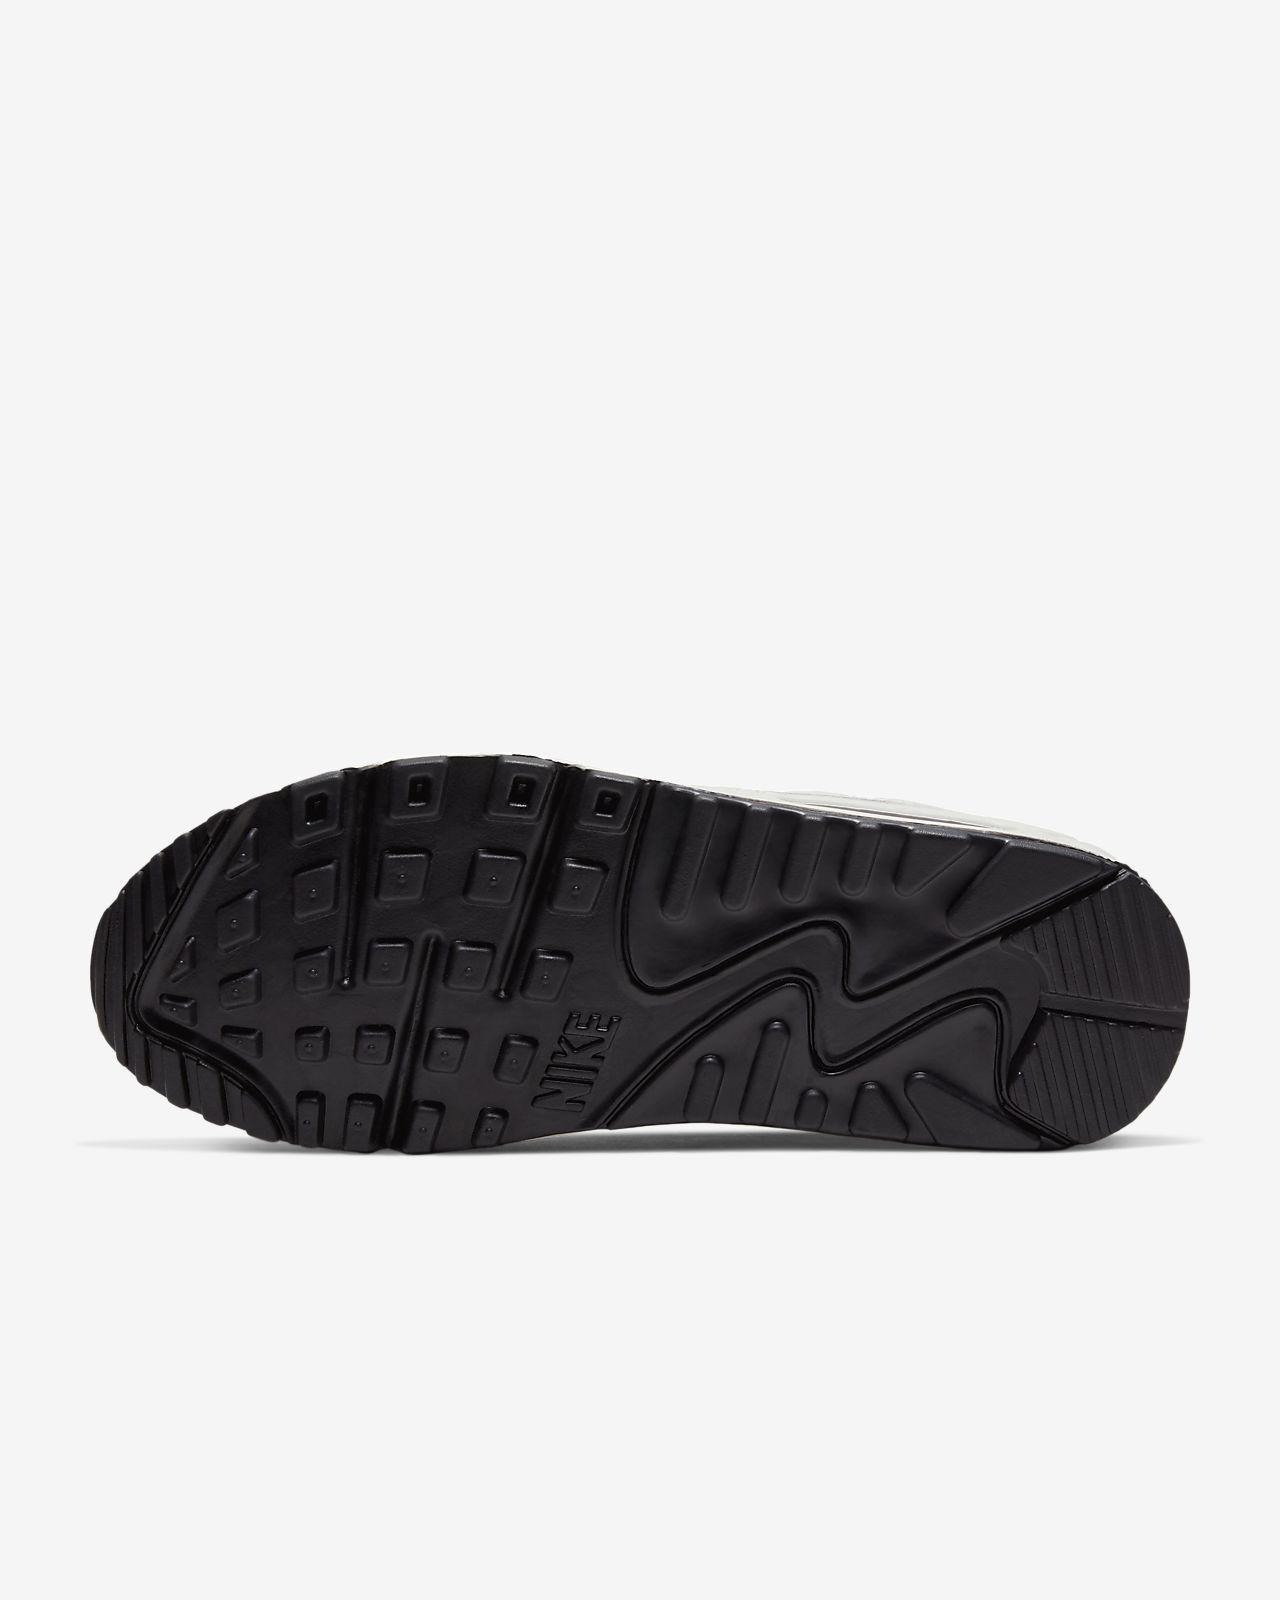 Nike Air Max 90 Premium 'Valentines Day' W